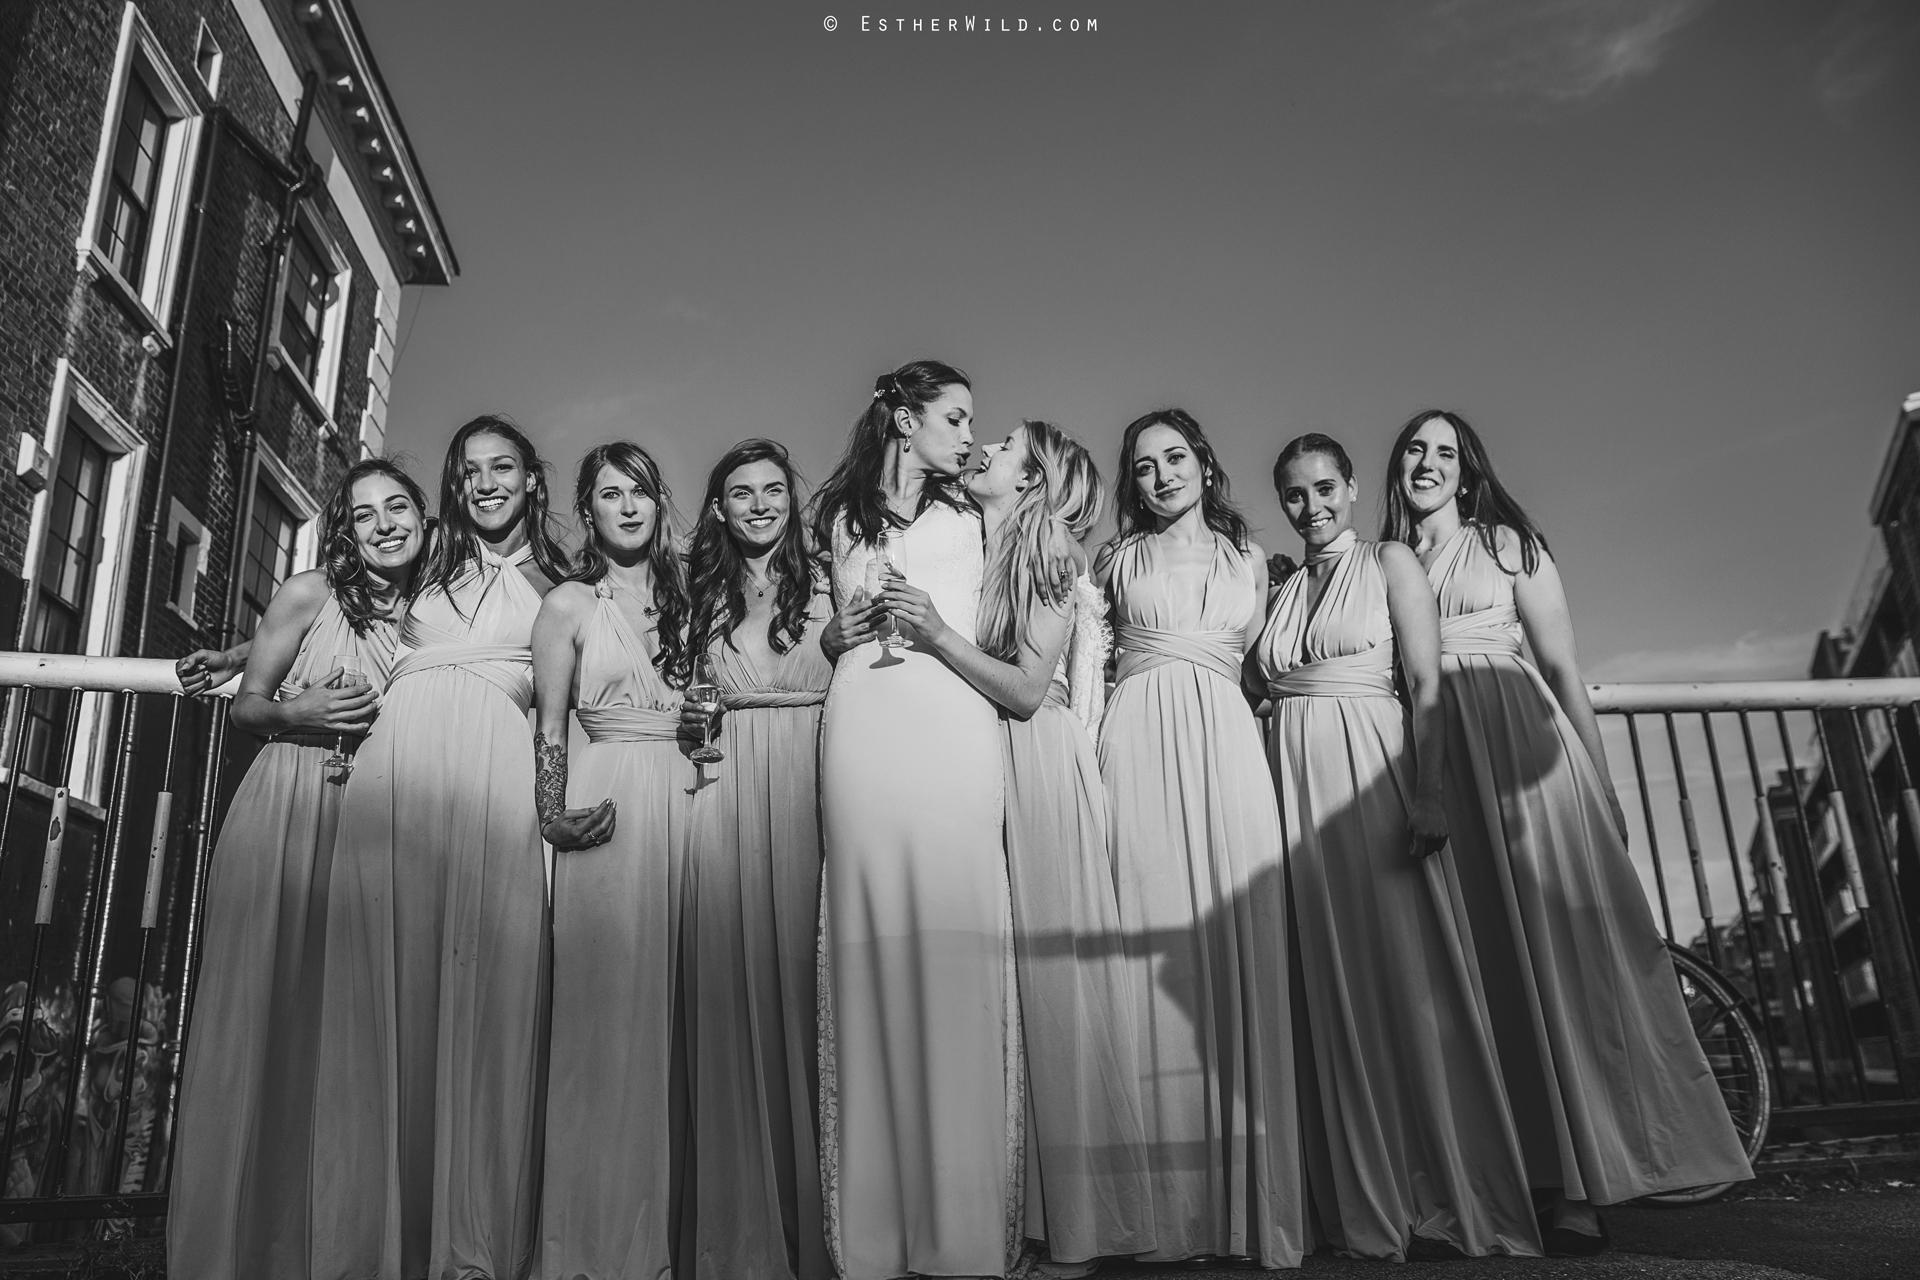 Islington_Town_Hall_Wedding_London_Photographer_Esther_Wild_IMG_7420-1.jpg